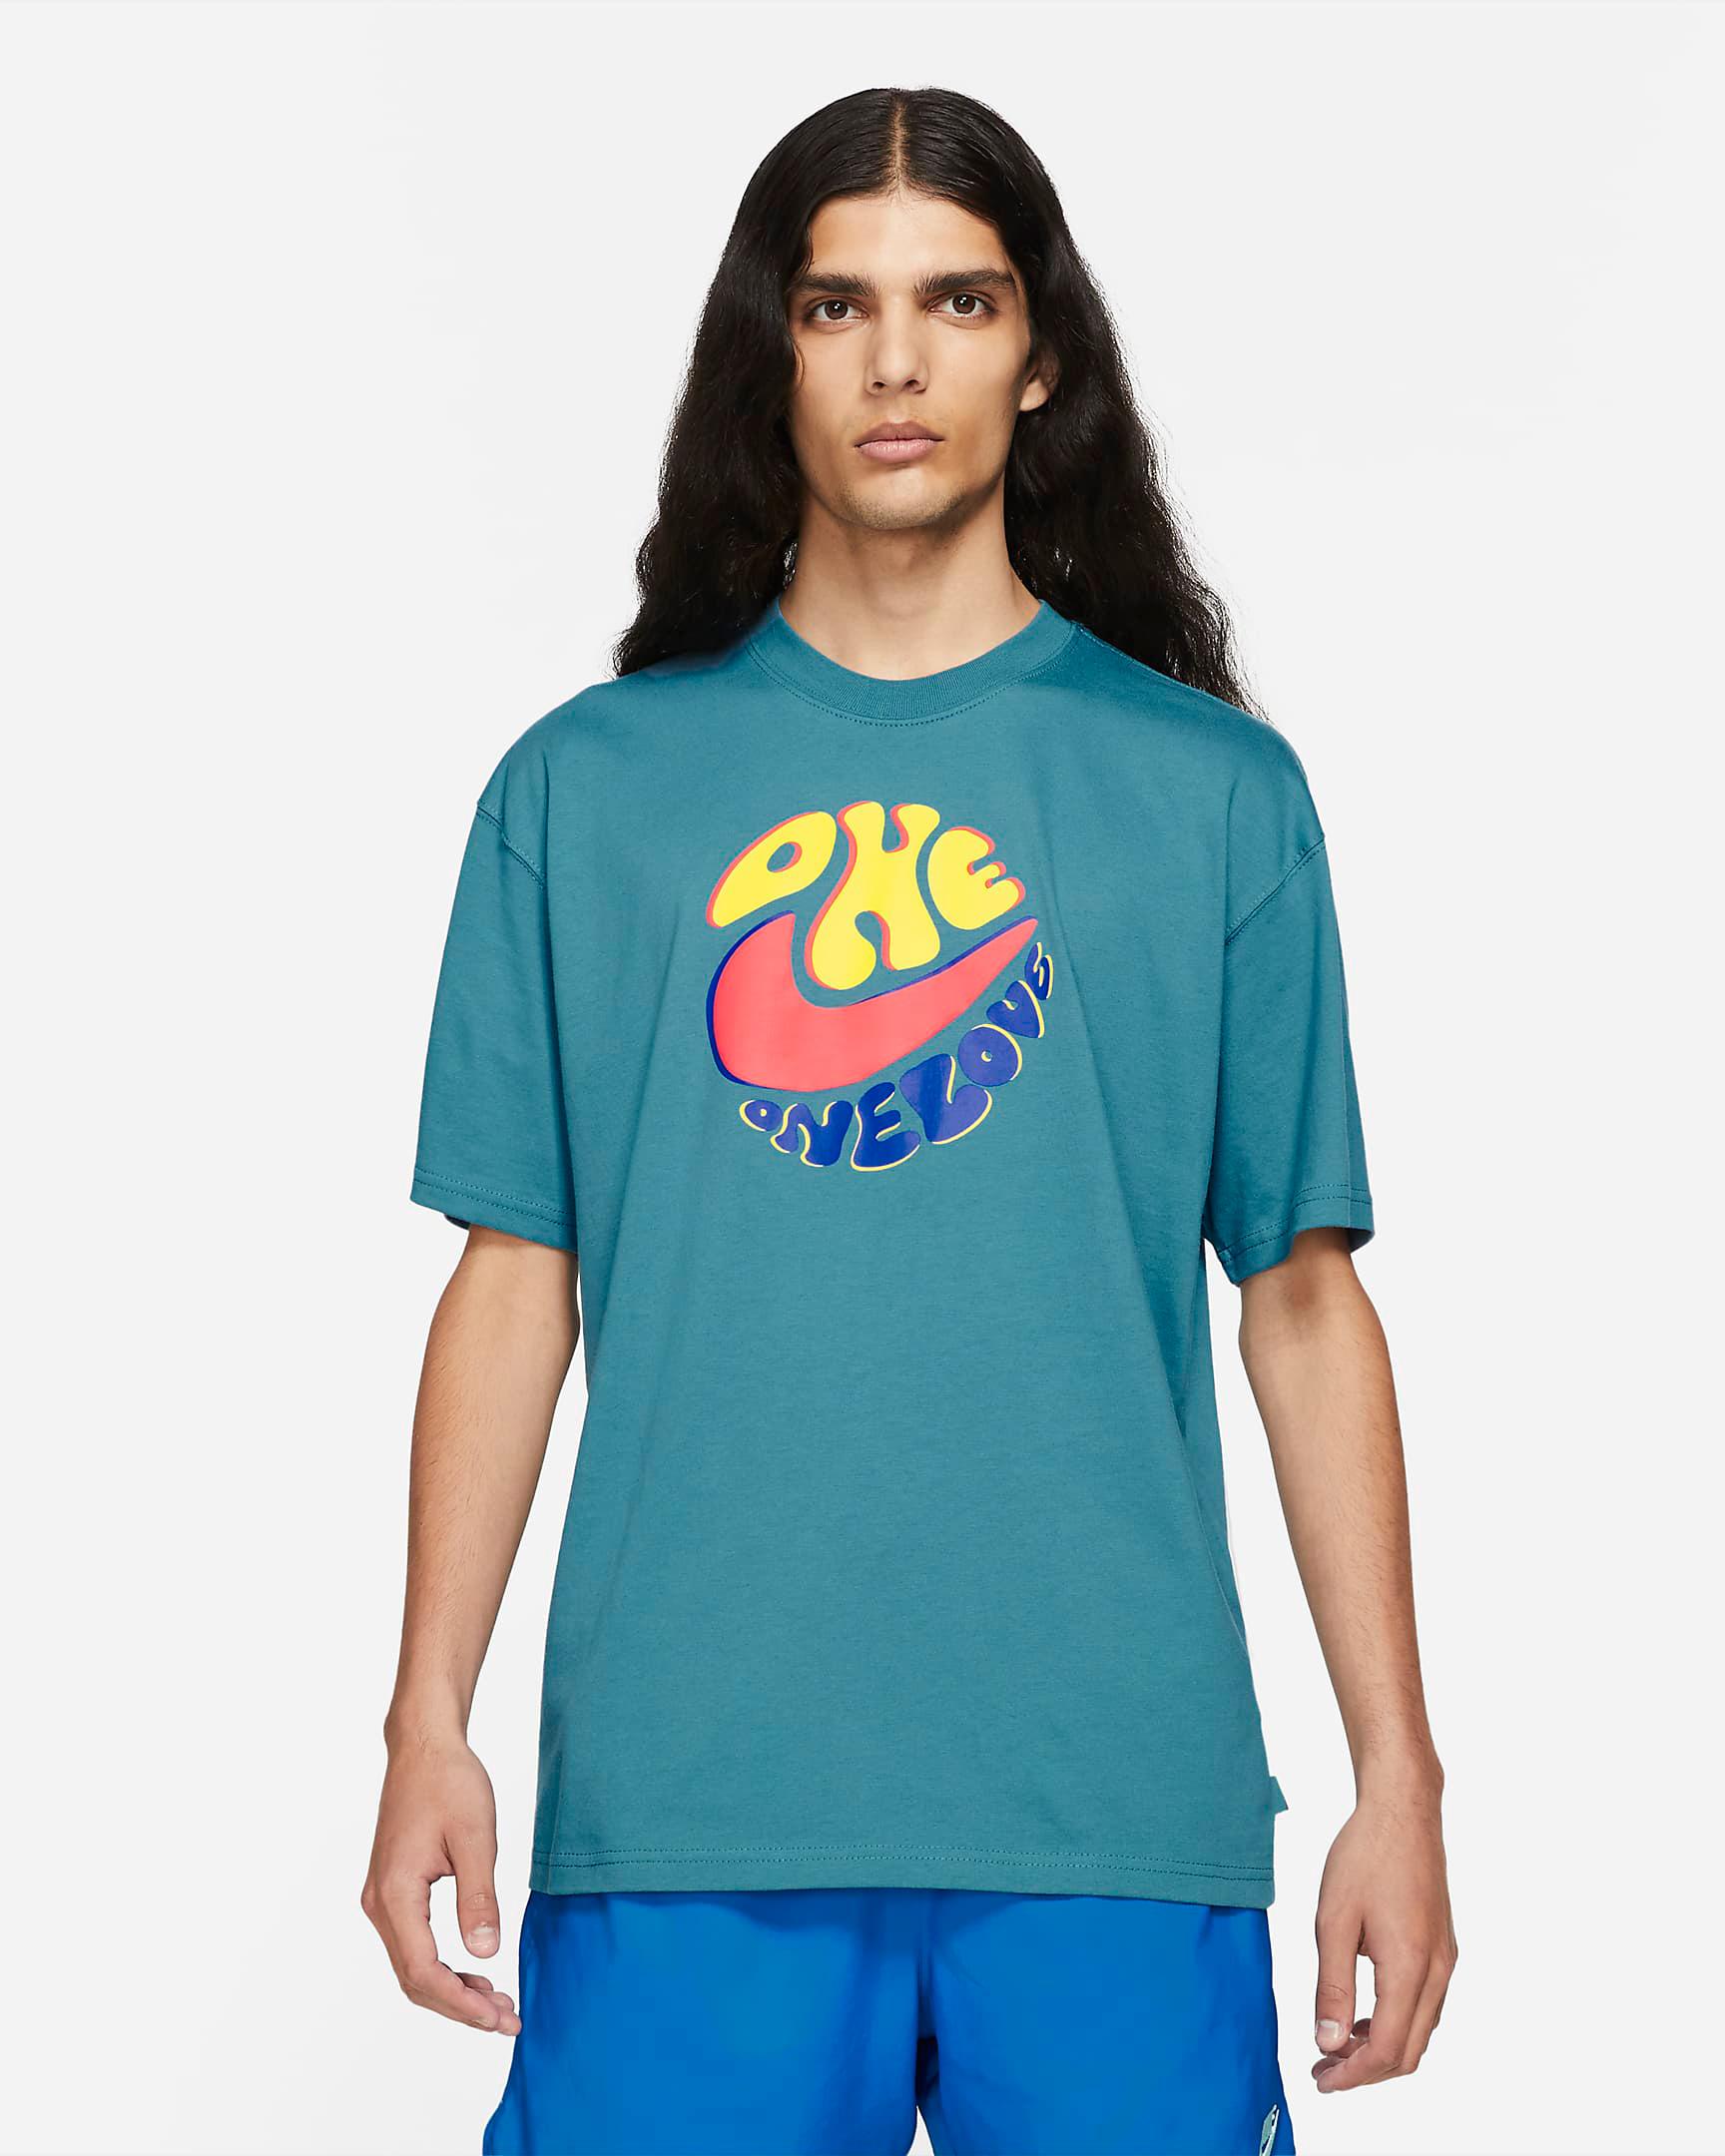 nike-rift-blue-one-love-t-shirt